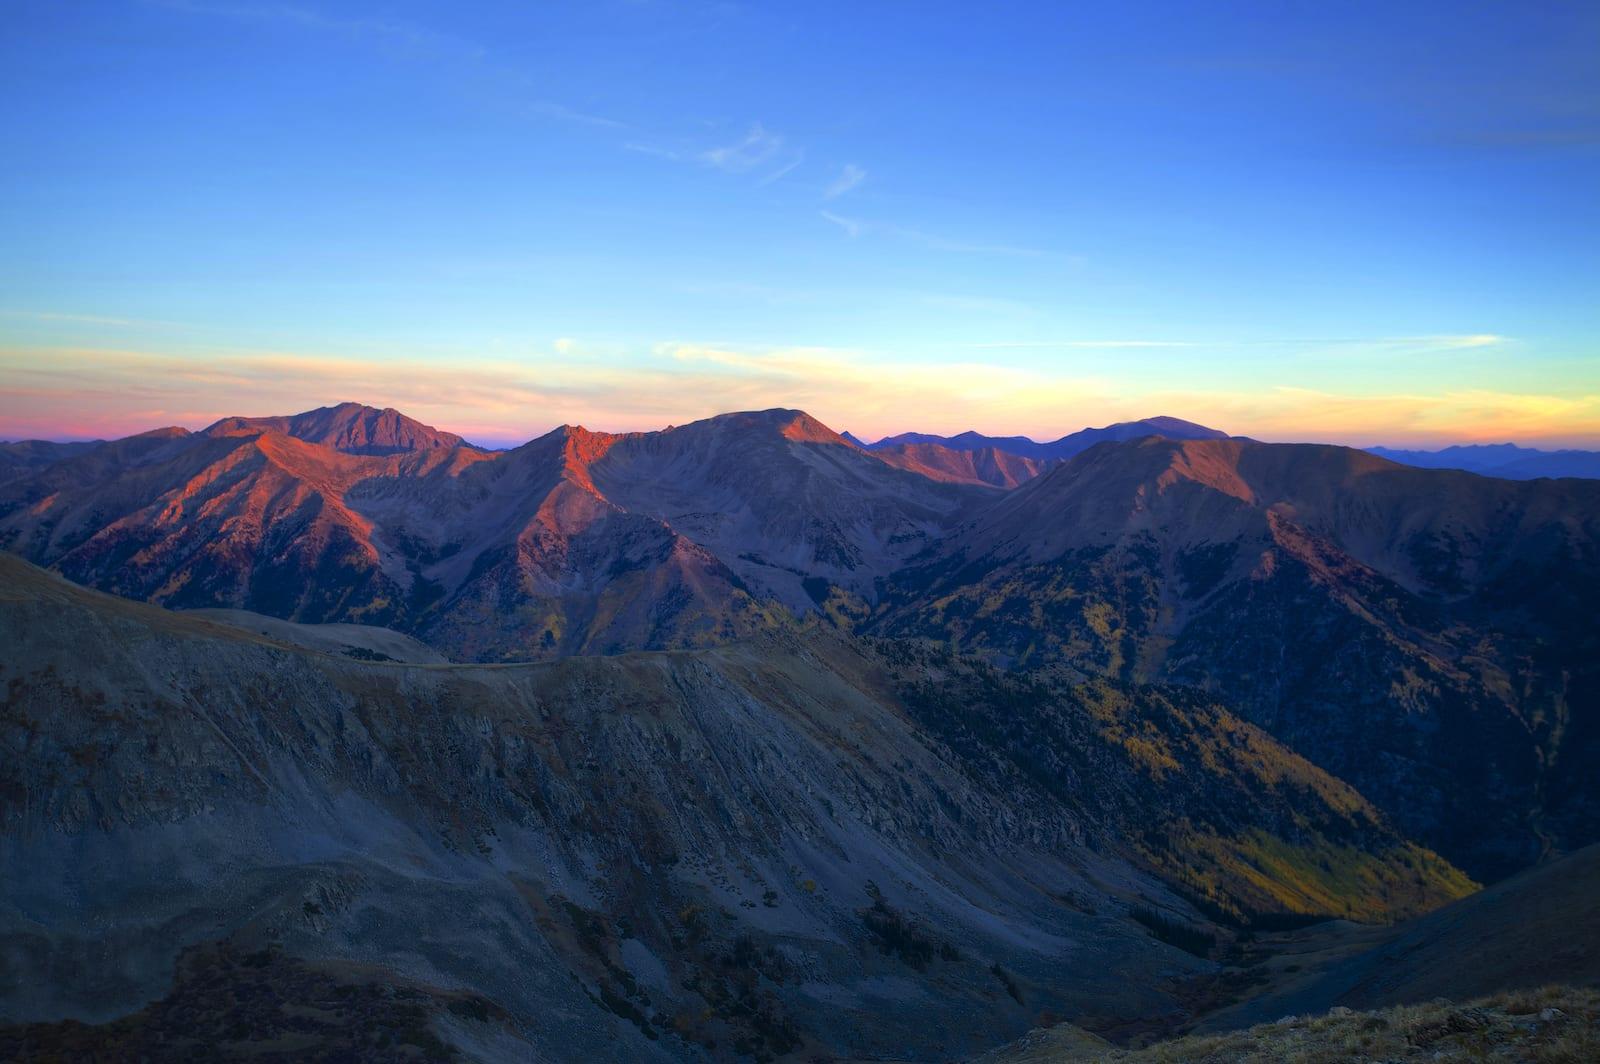 Mt Belford Colorado 14er Sunrise Hike